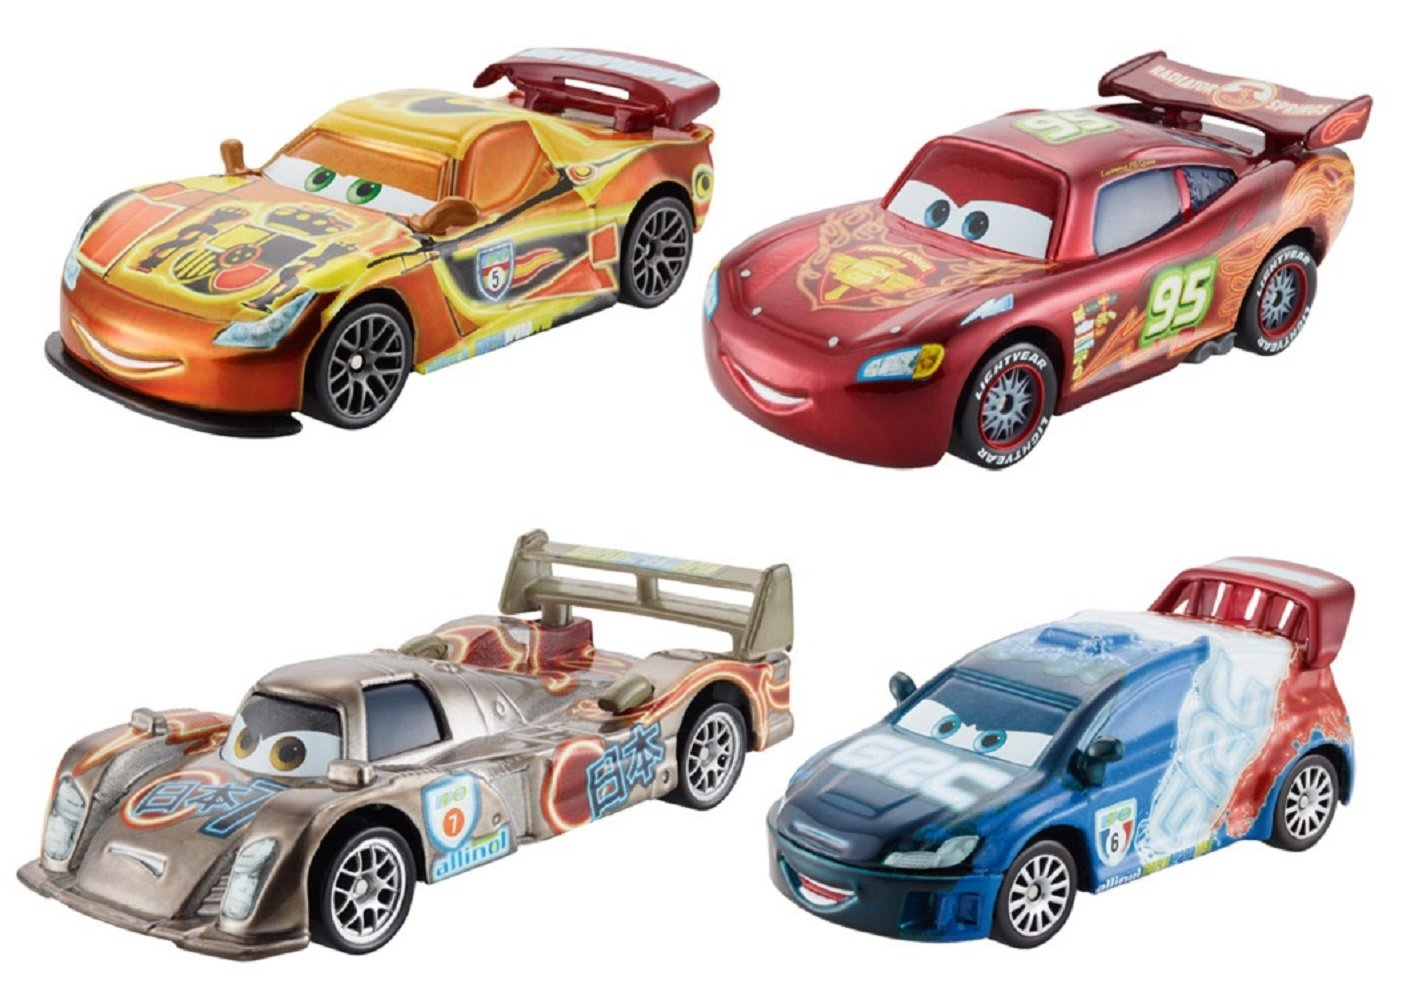 Amazon disneypixar cars neon die cast vehicle 4 pack toys amazon disneypixar cars neon die cast vehicle 4 pack toys games sciox Choice Image